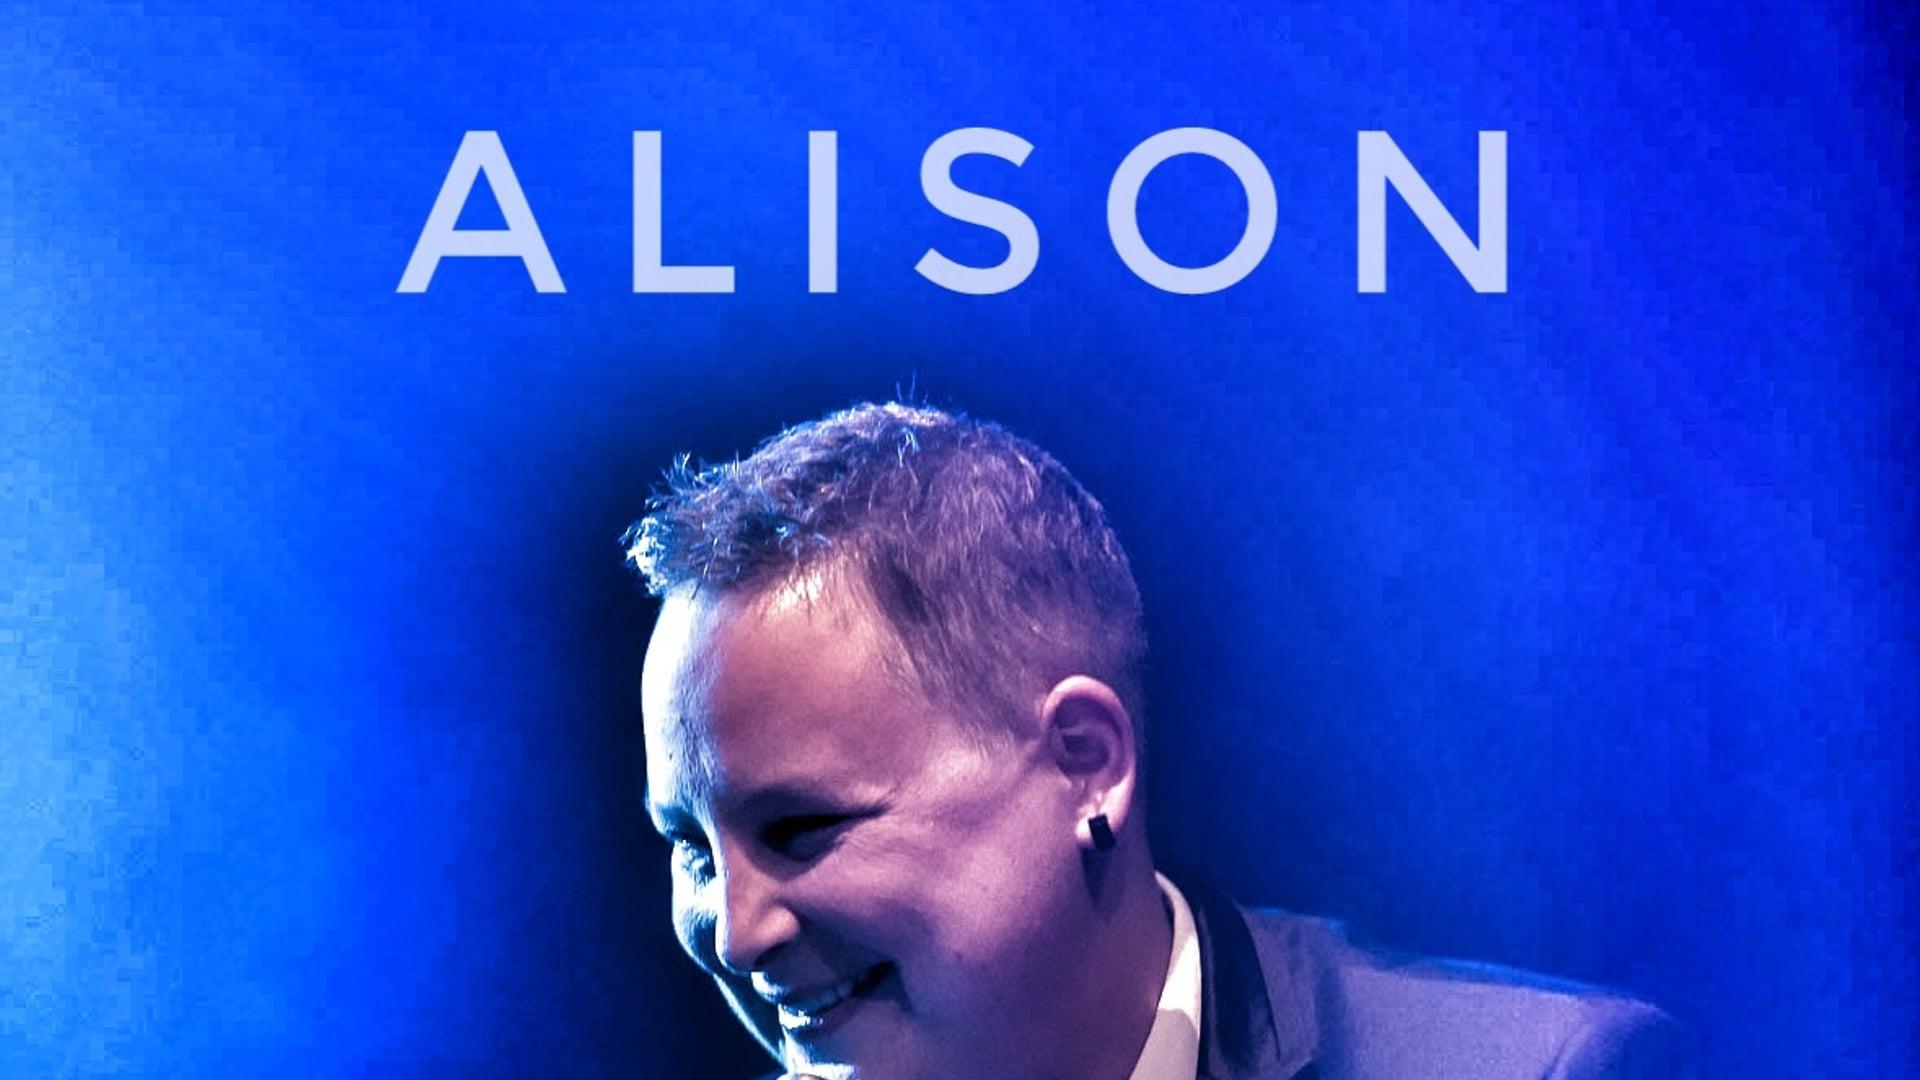 Alison Member Feature